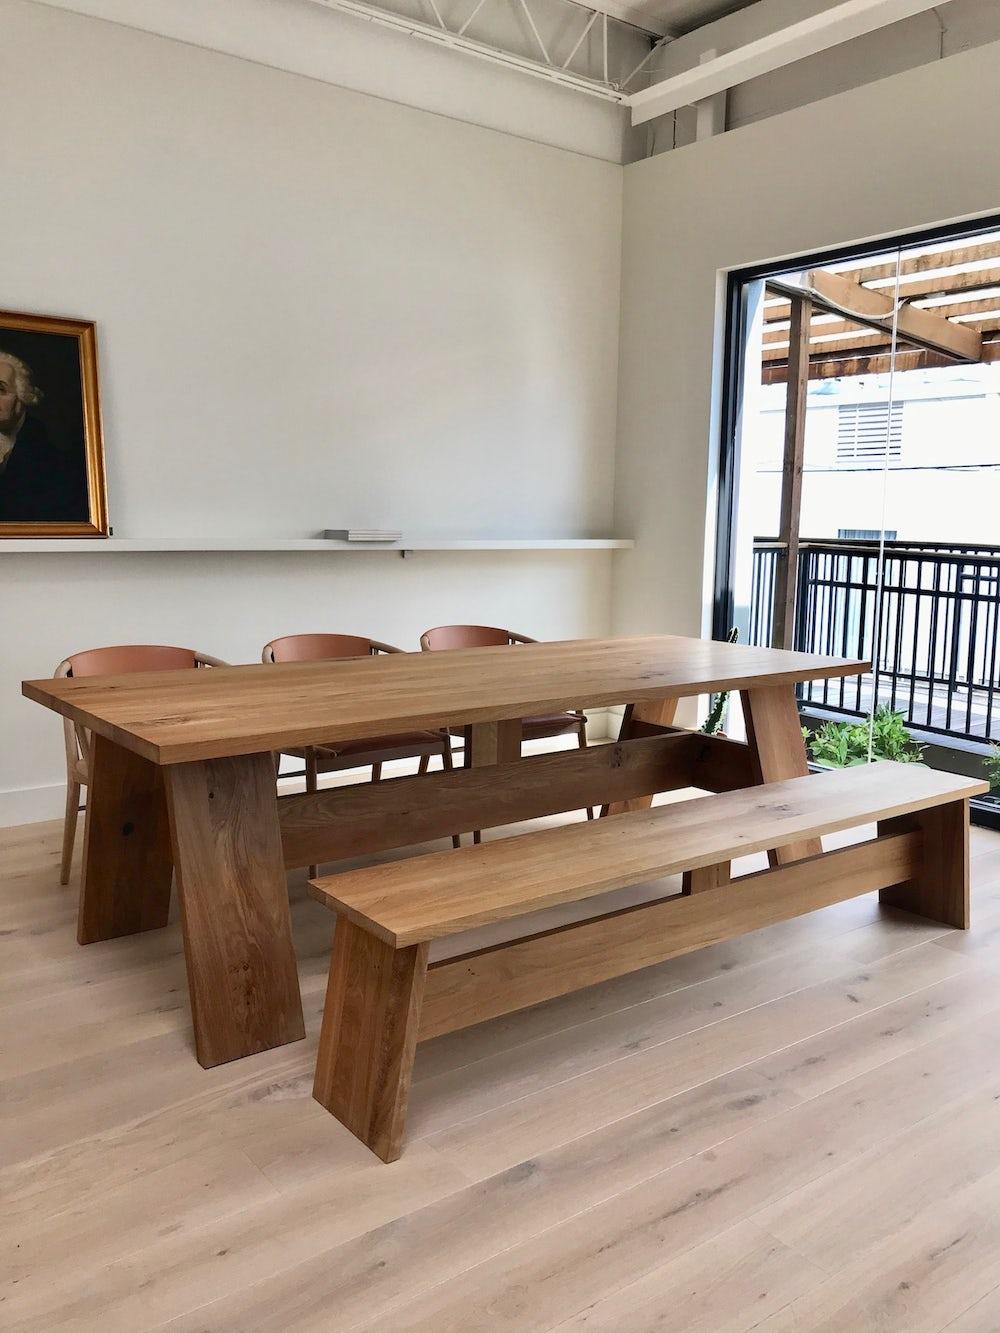 Fayland table showroom sale